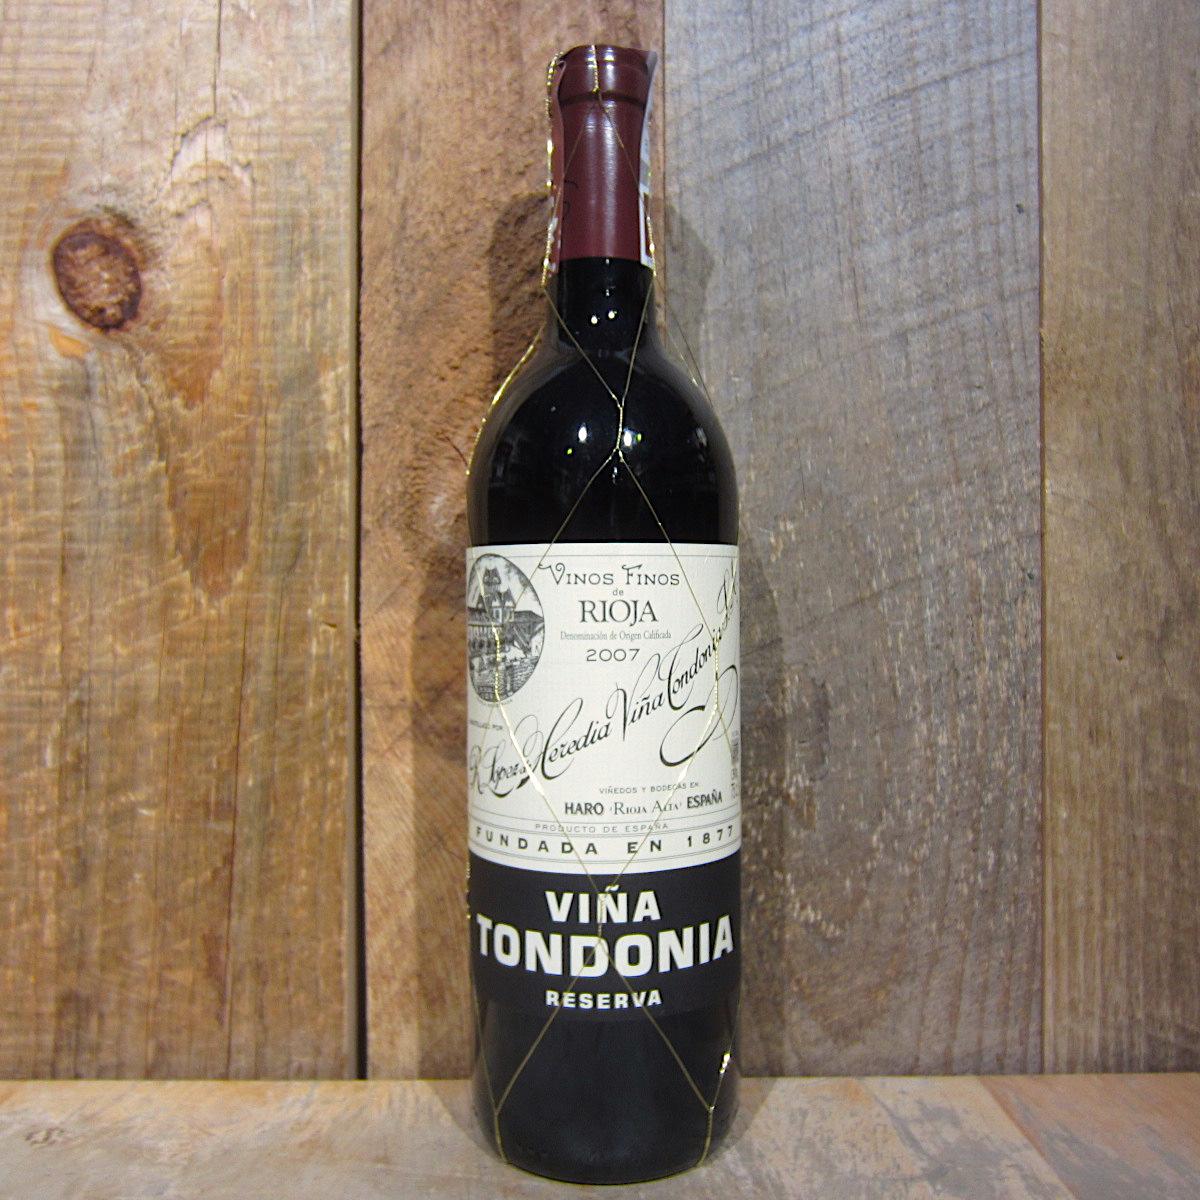 Lopez de Heredia Vina Tondonia Reserva Rioja 2008 750ml